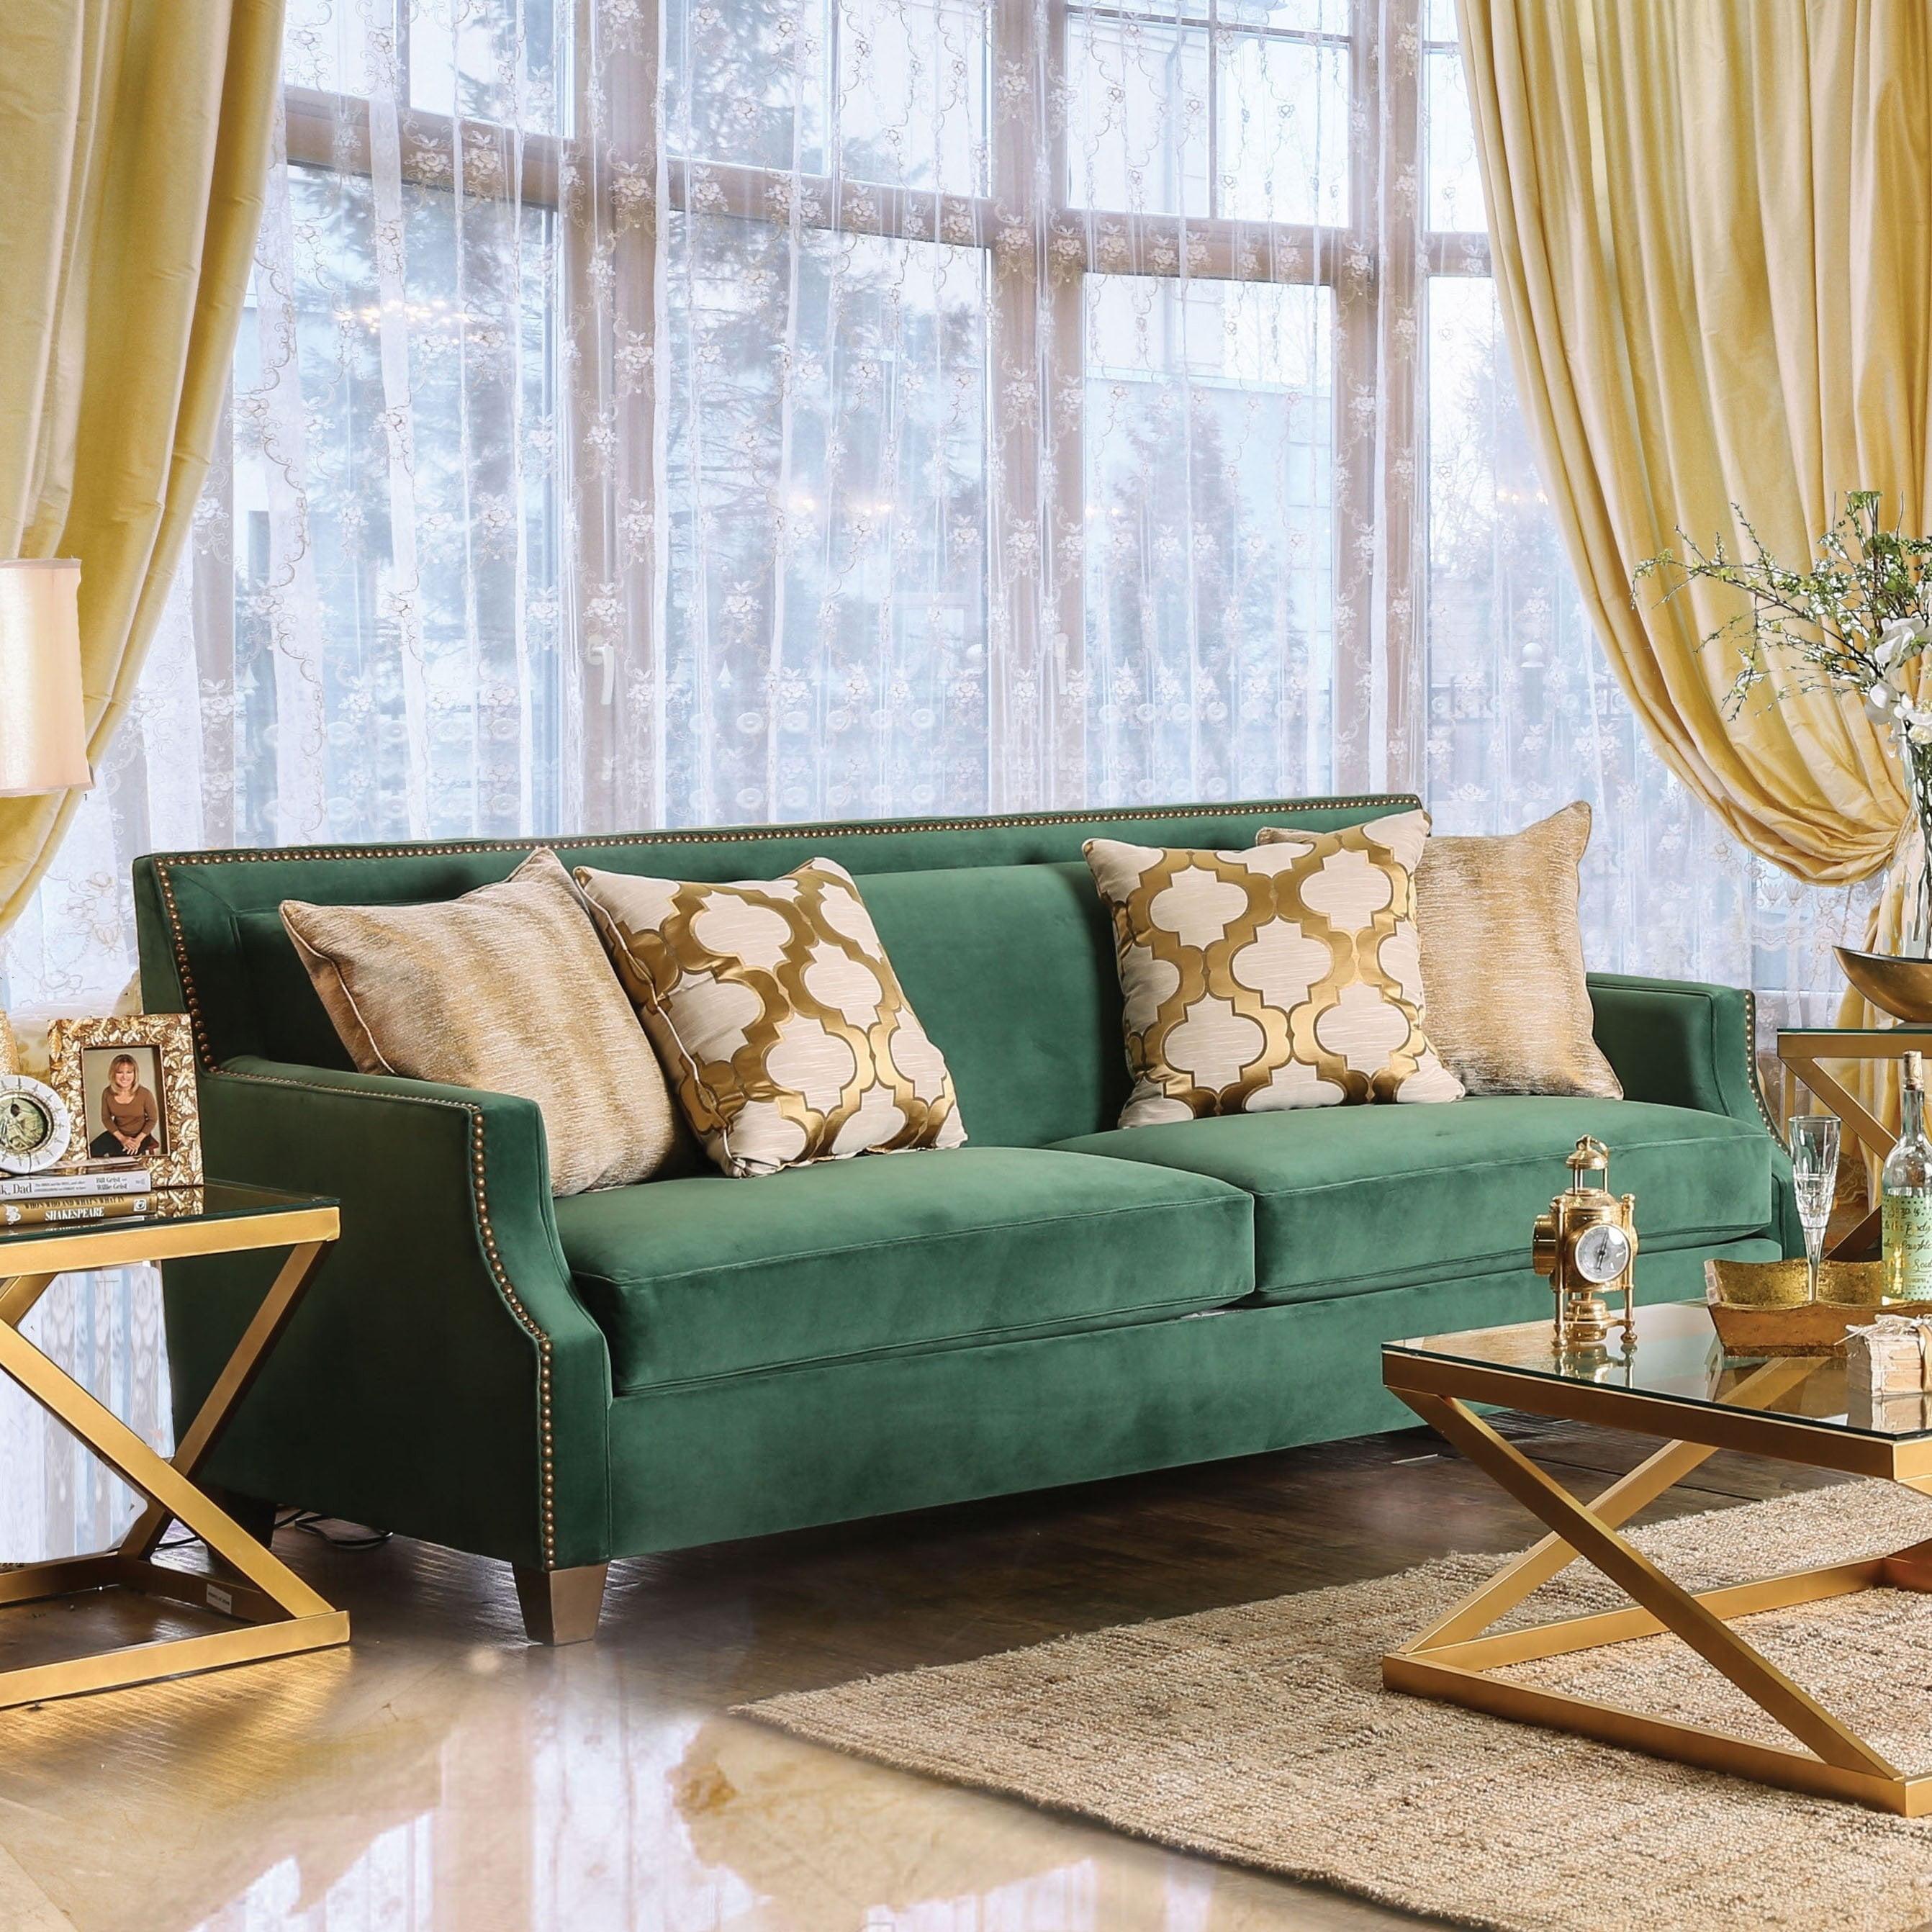 Furniture Of America Yaur Contemporary Green Fabric Nailhead Trim Sofa Walmart Com Walmart Com